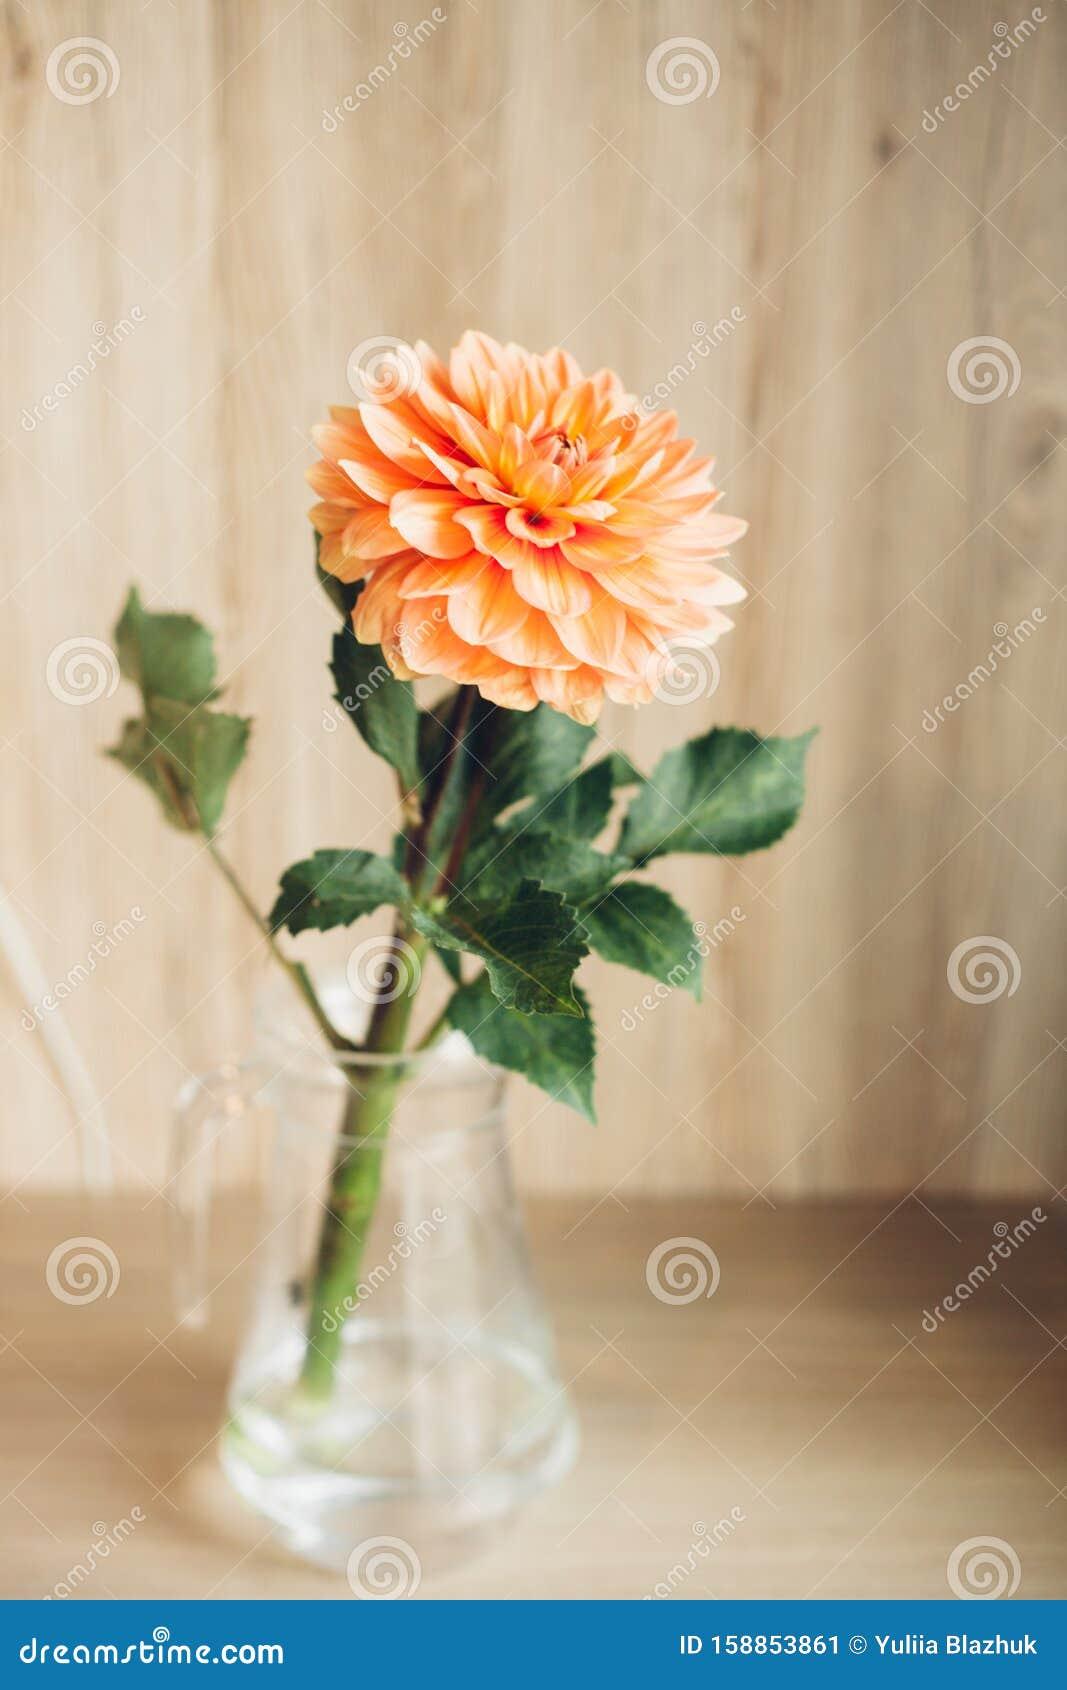 Orange Dahlia Single Flower In The Glass Vase On Table ...